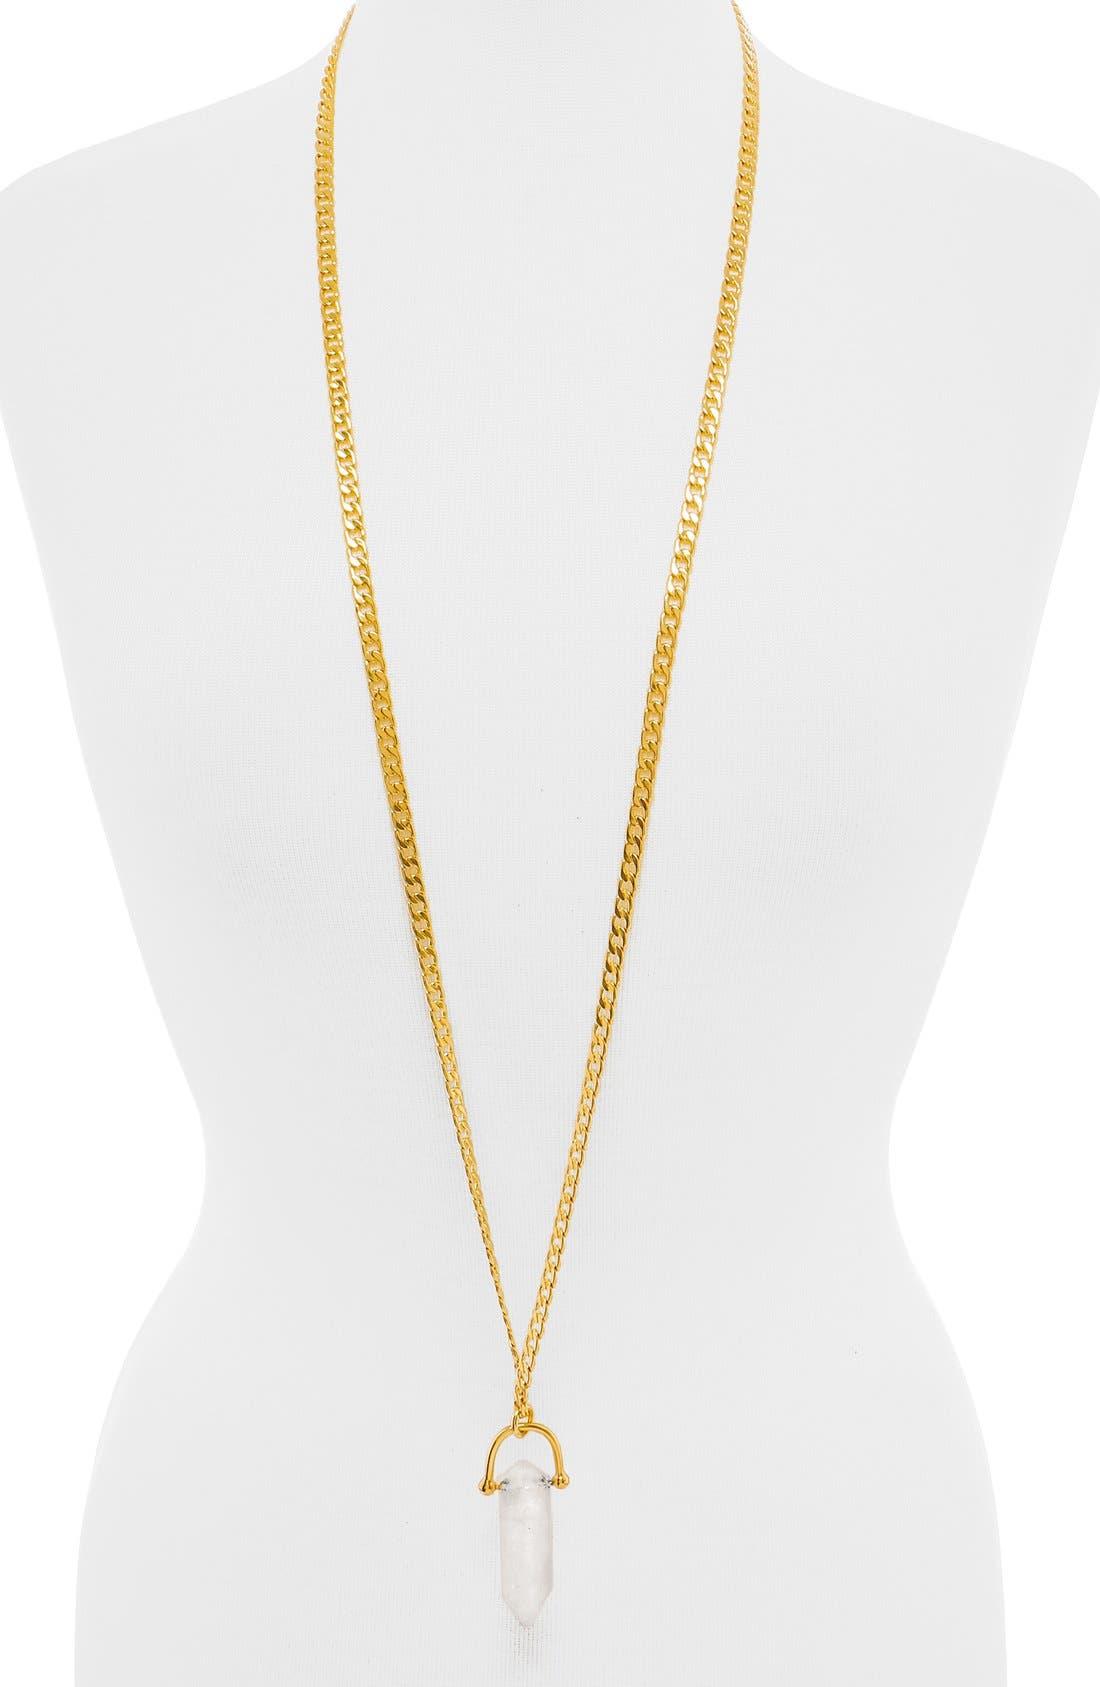 Alternate Image 3  - BaubleBar x Olivia Palermo Quartz Pendant Necklace